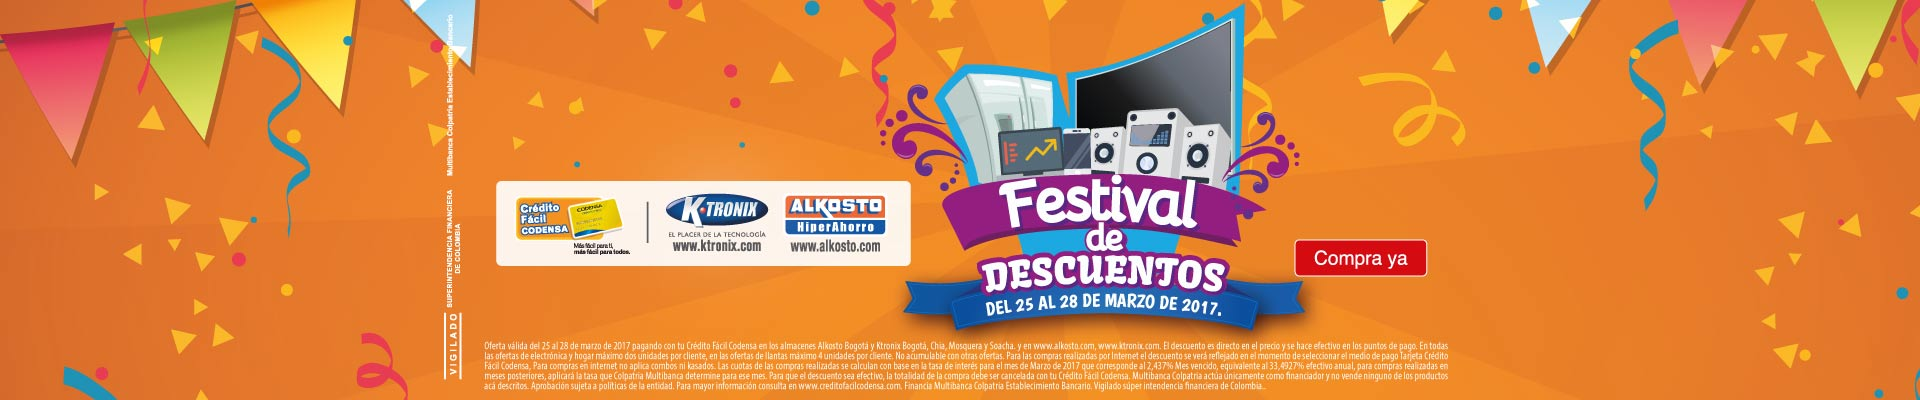 CAT Festival descuentos Codensa 25 Mar